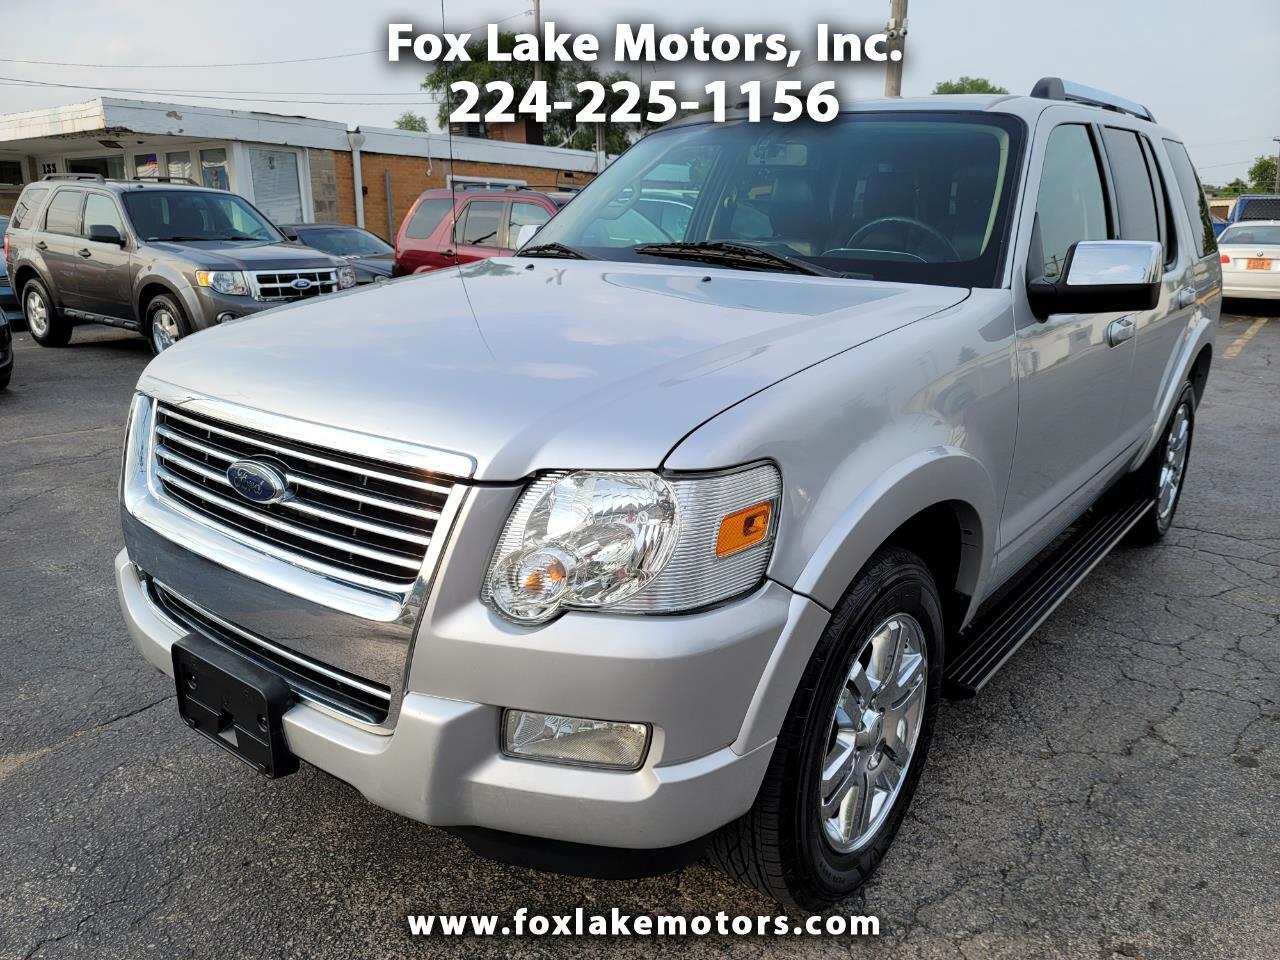 Ford Explorer Limited 4.0L 4WD 2010